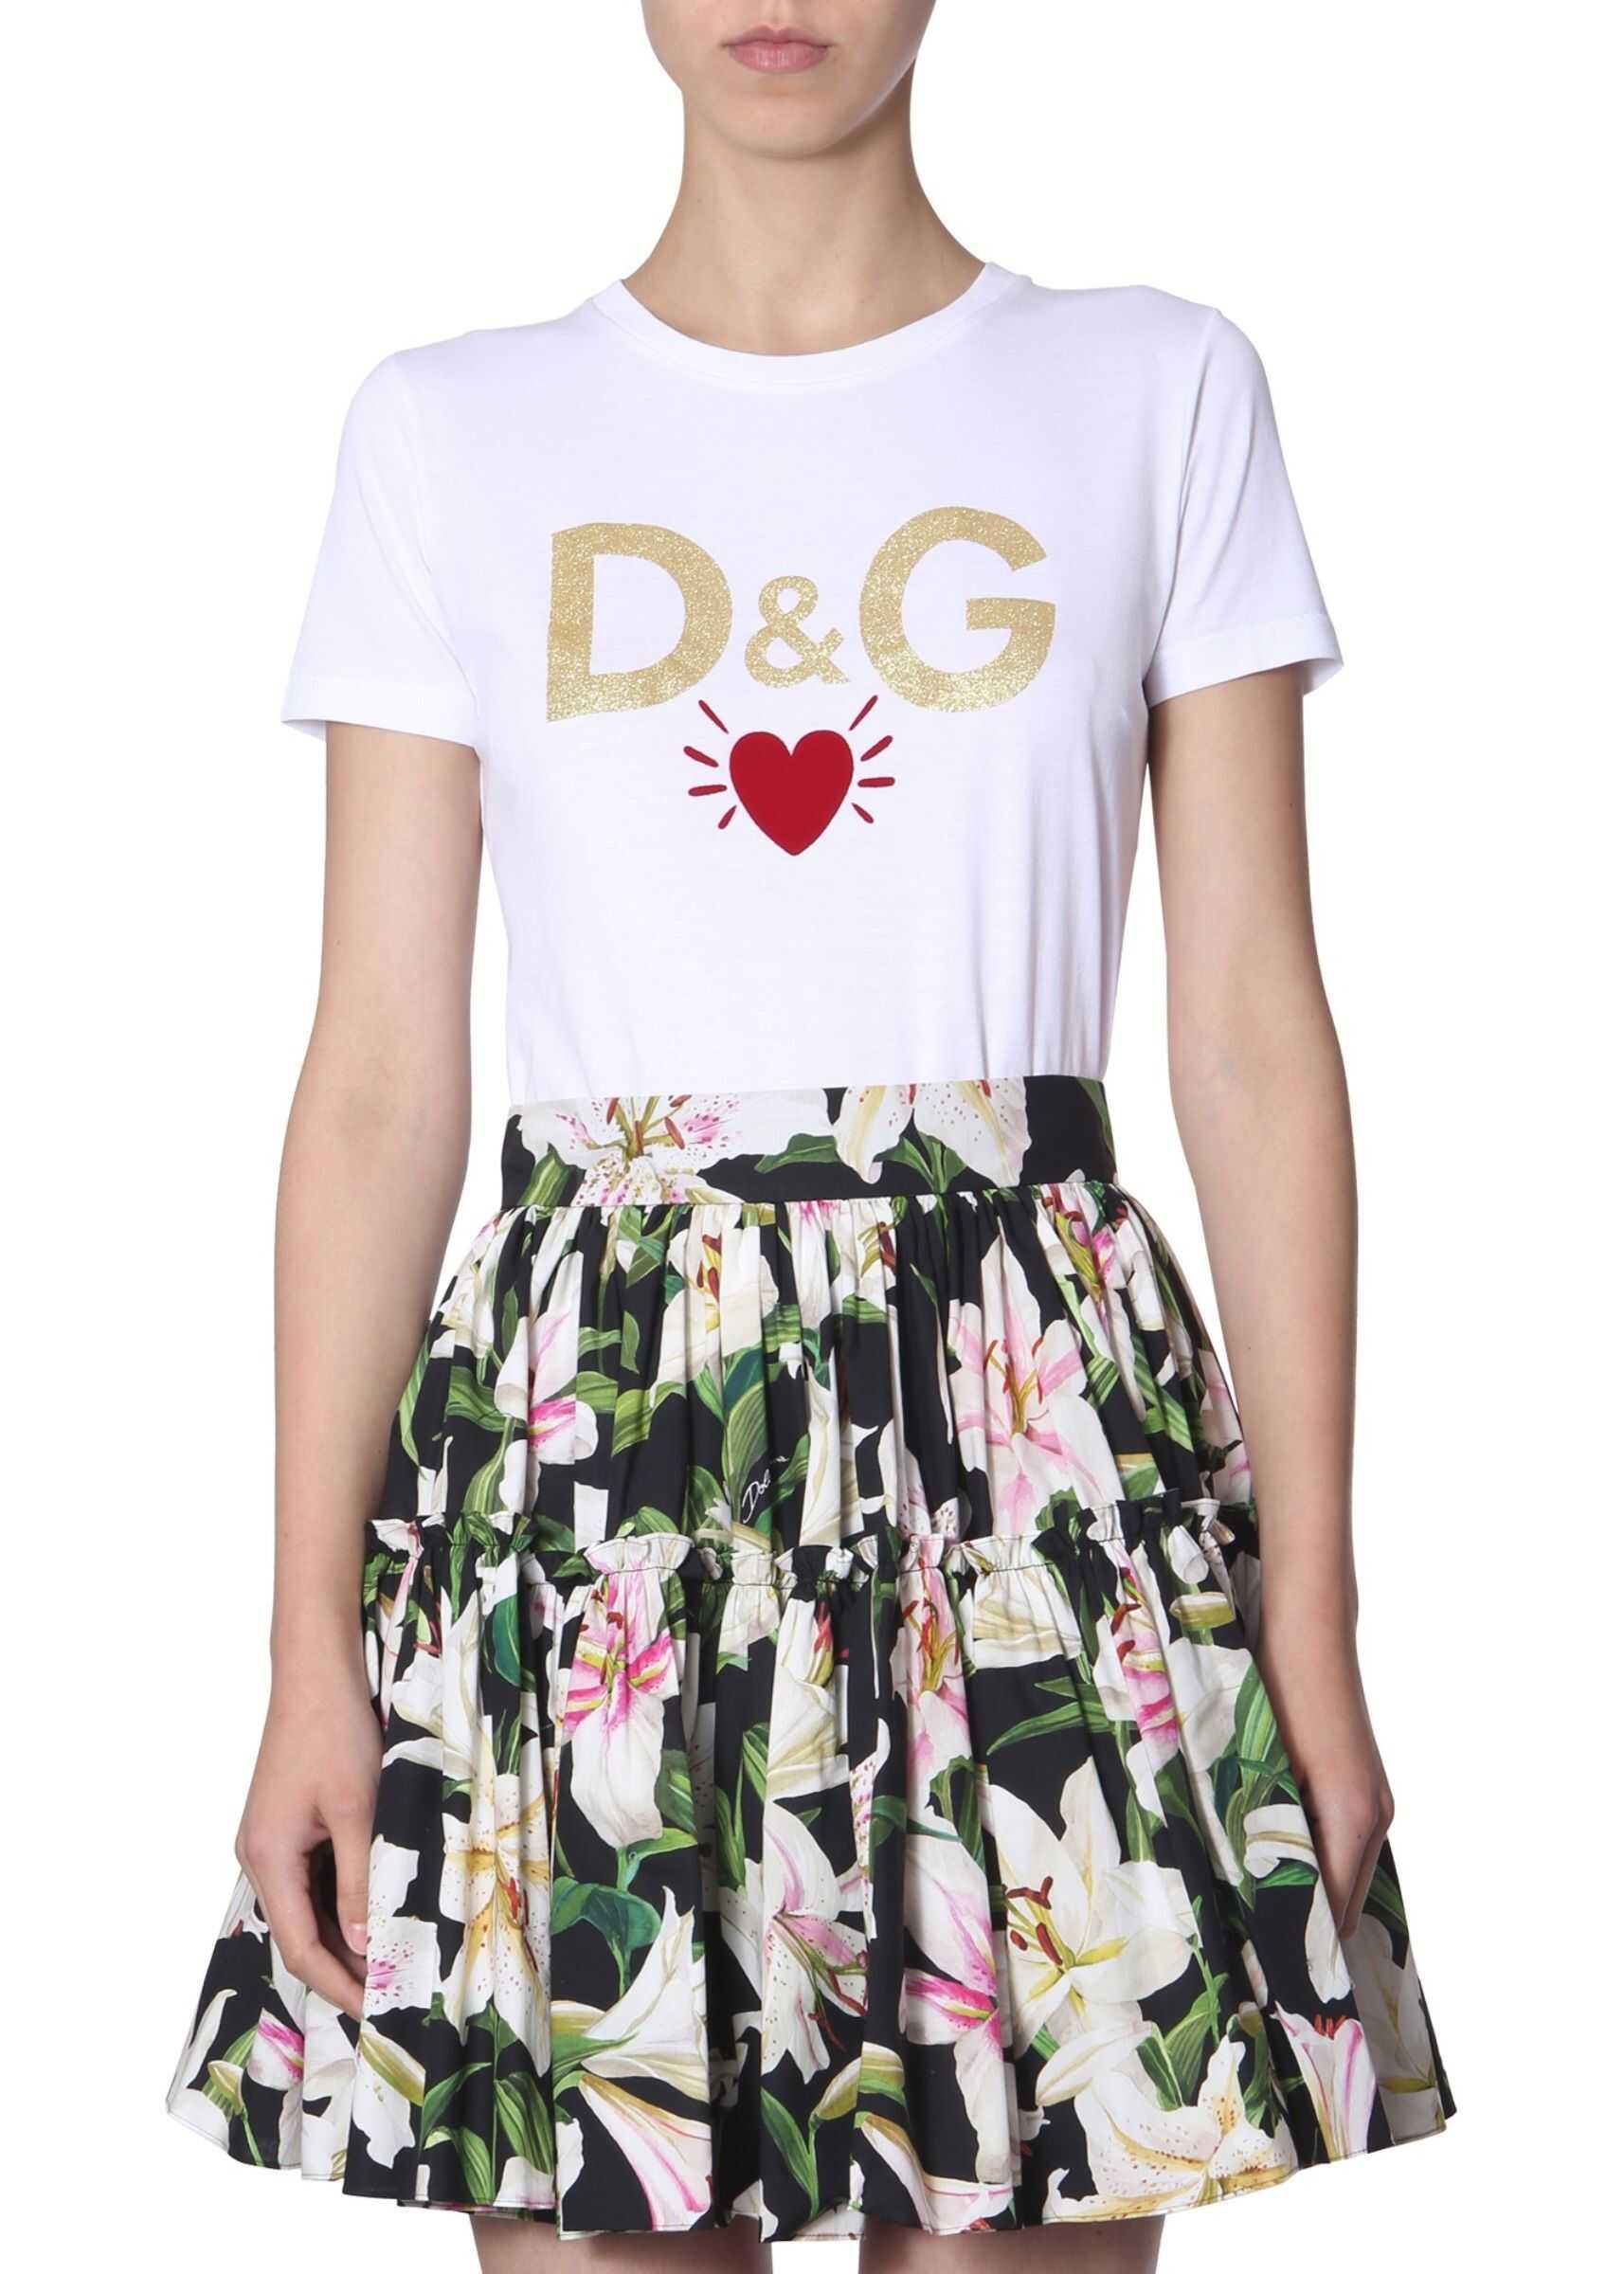 Dolce & Gabbana Cotton Jersey T-Shirt WHITE